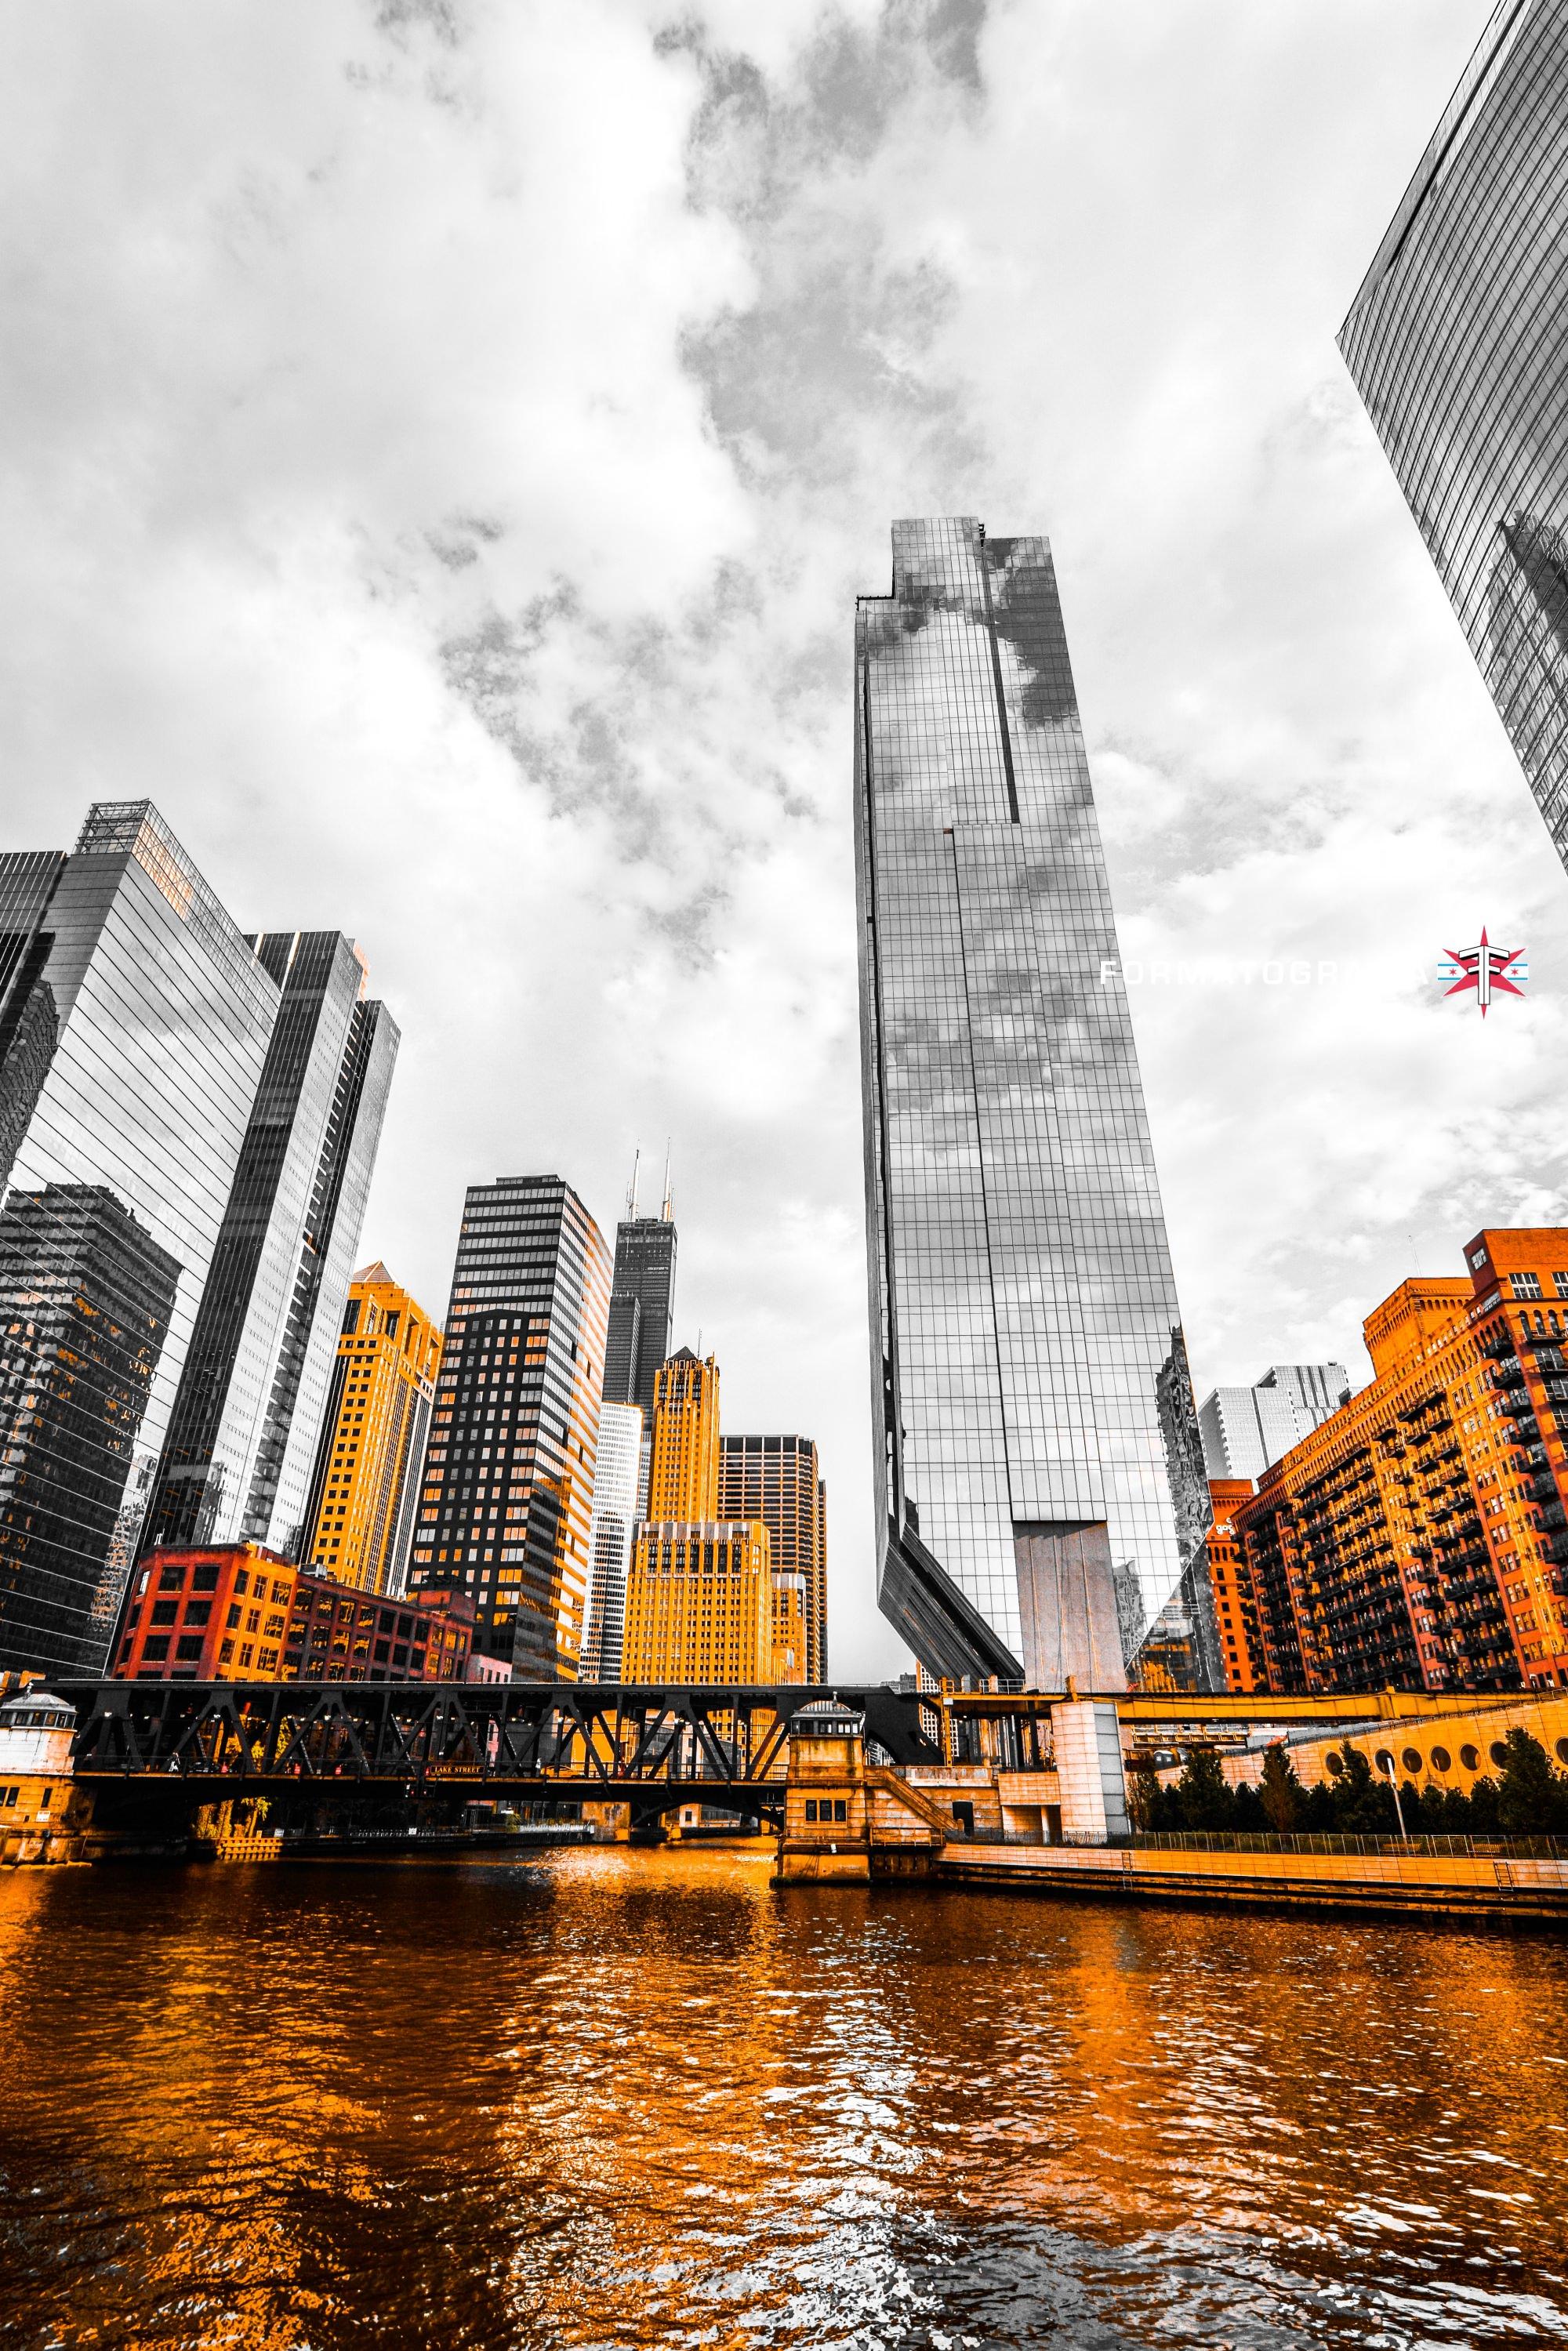 eric formato chicago photographer fall update city architecture shotsDSC_0507-2.jpg